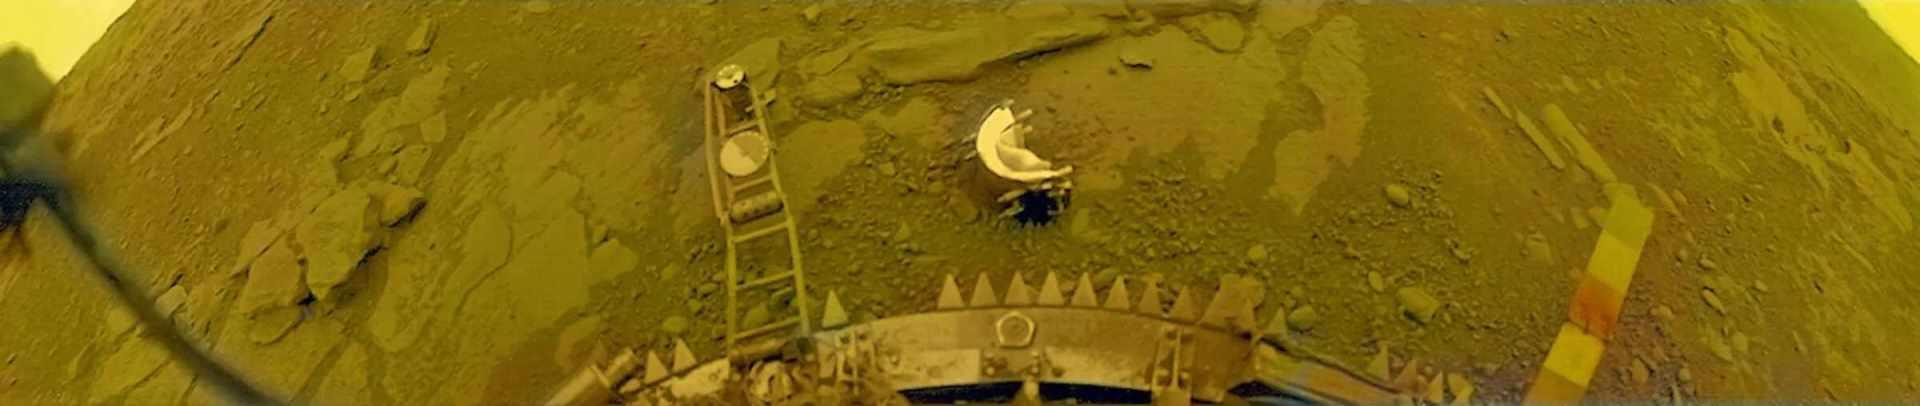 Sonda Sovjetskog saveza Venera 13 snimila je dvobojne panorame površine Venere 1982.